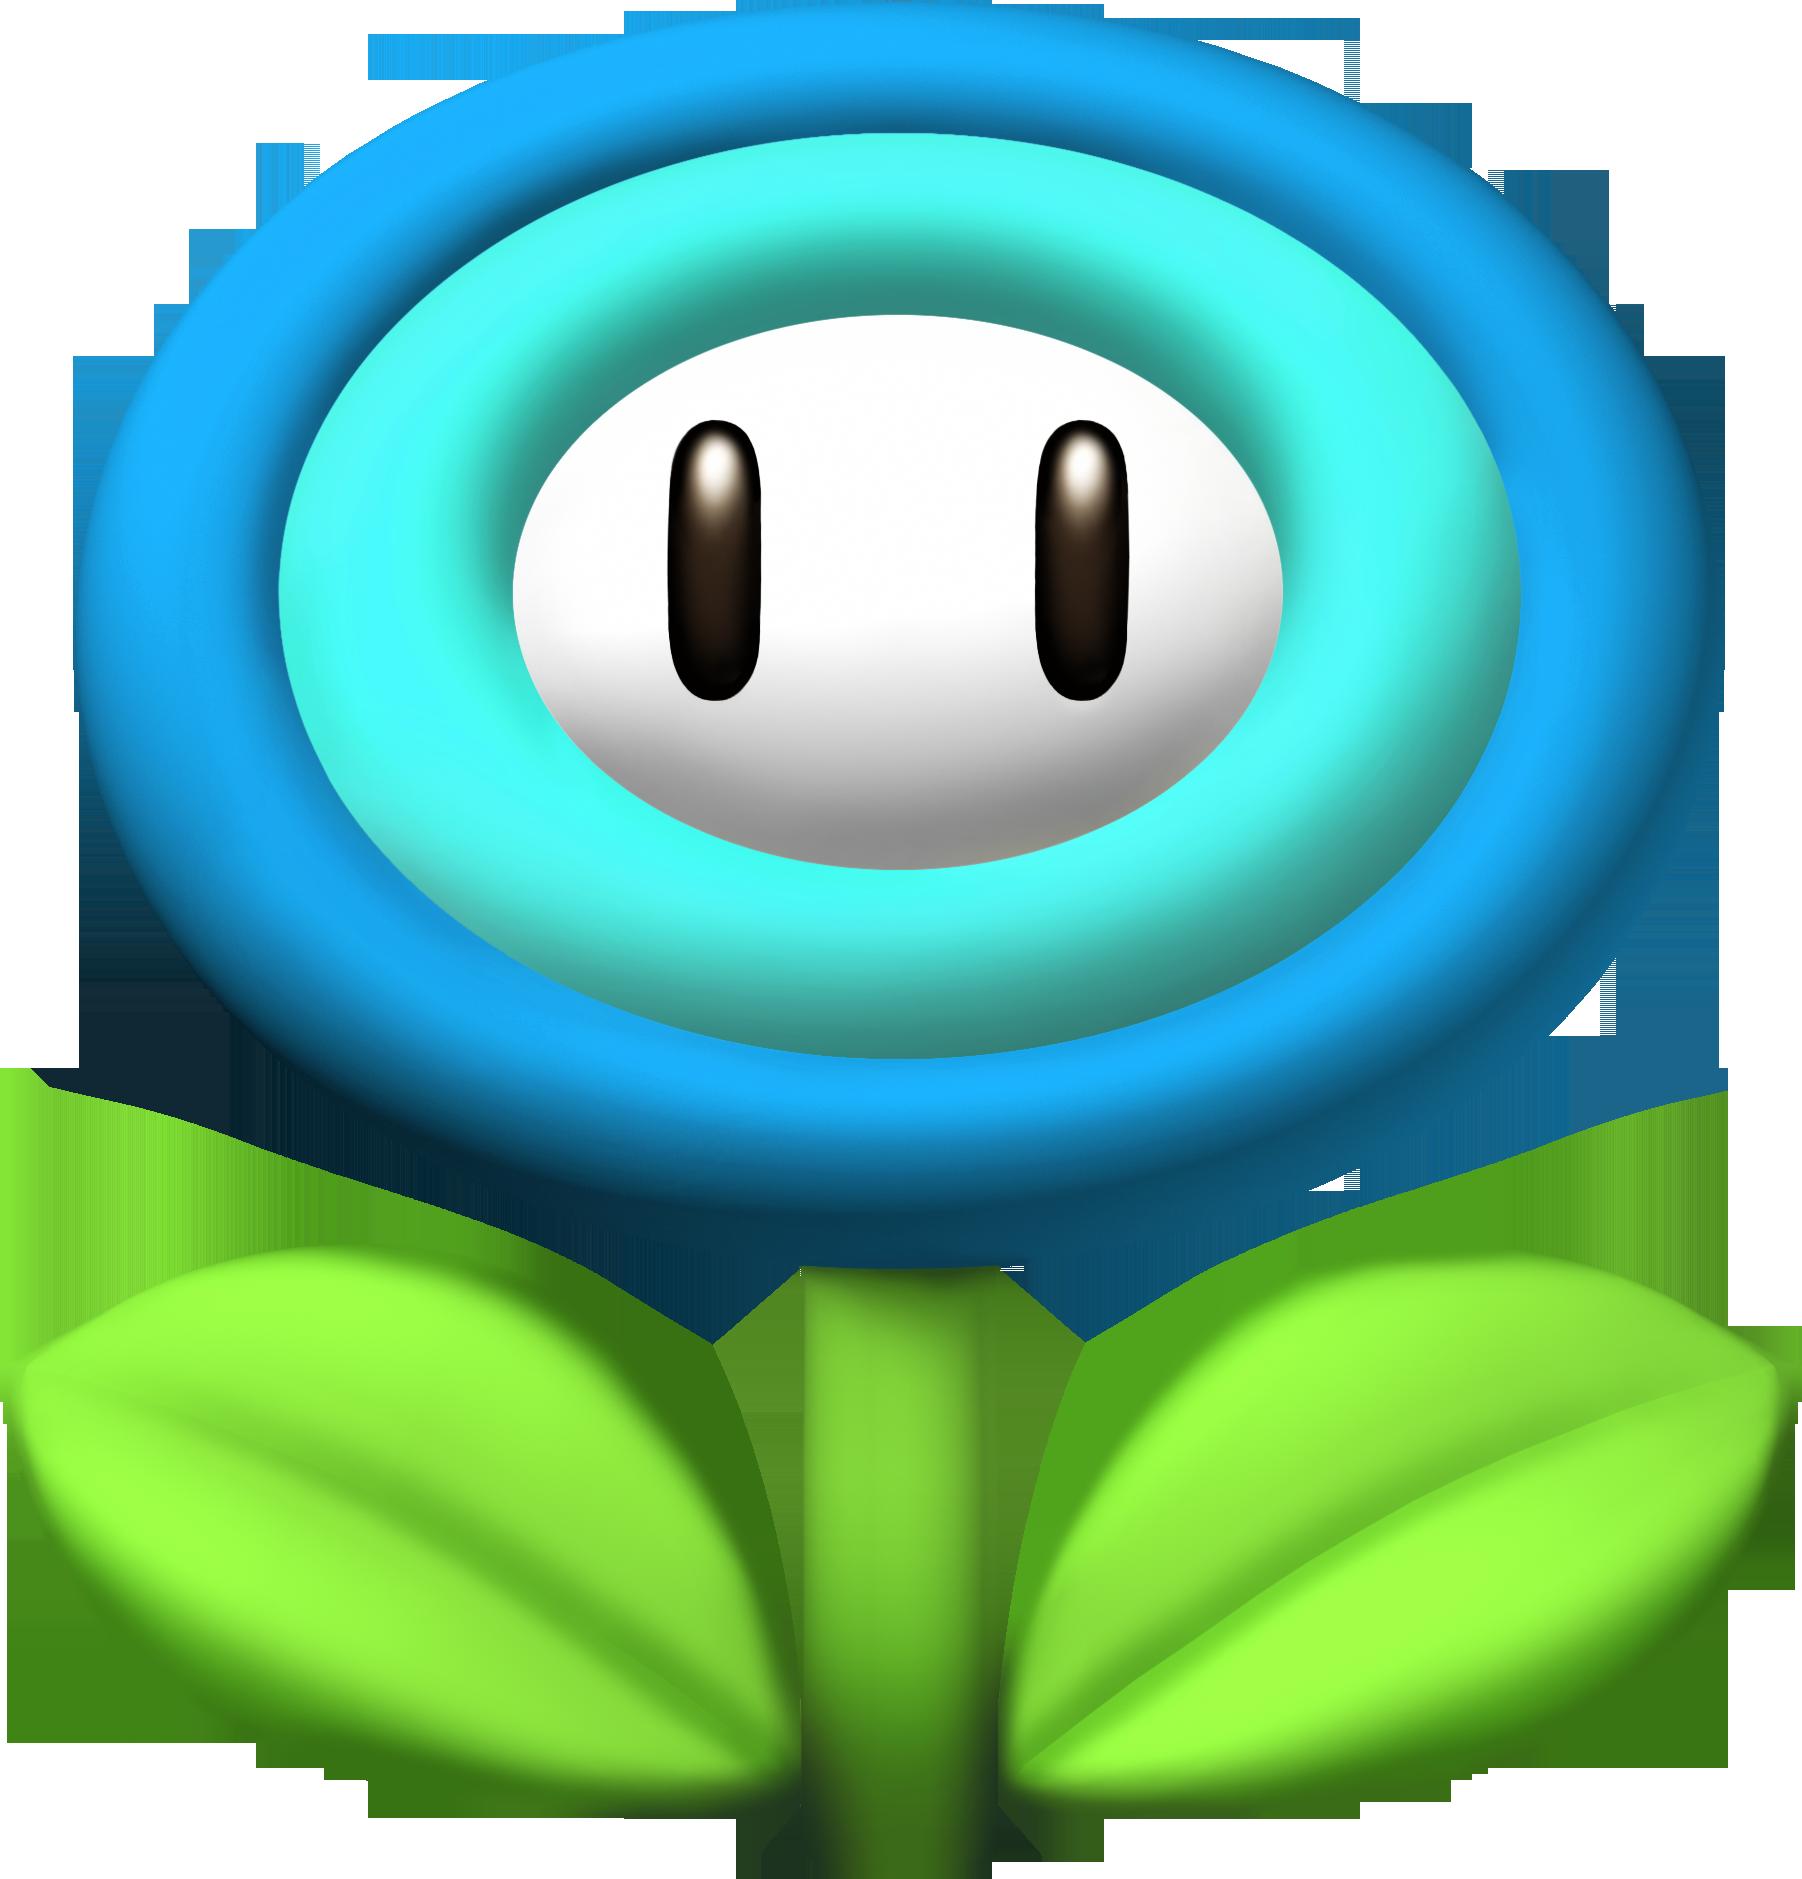 Ice Flower  Fantendo - Game Ideas & More  Fandom